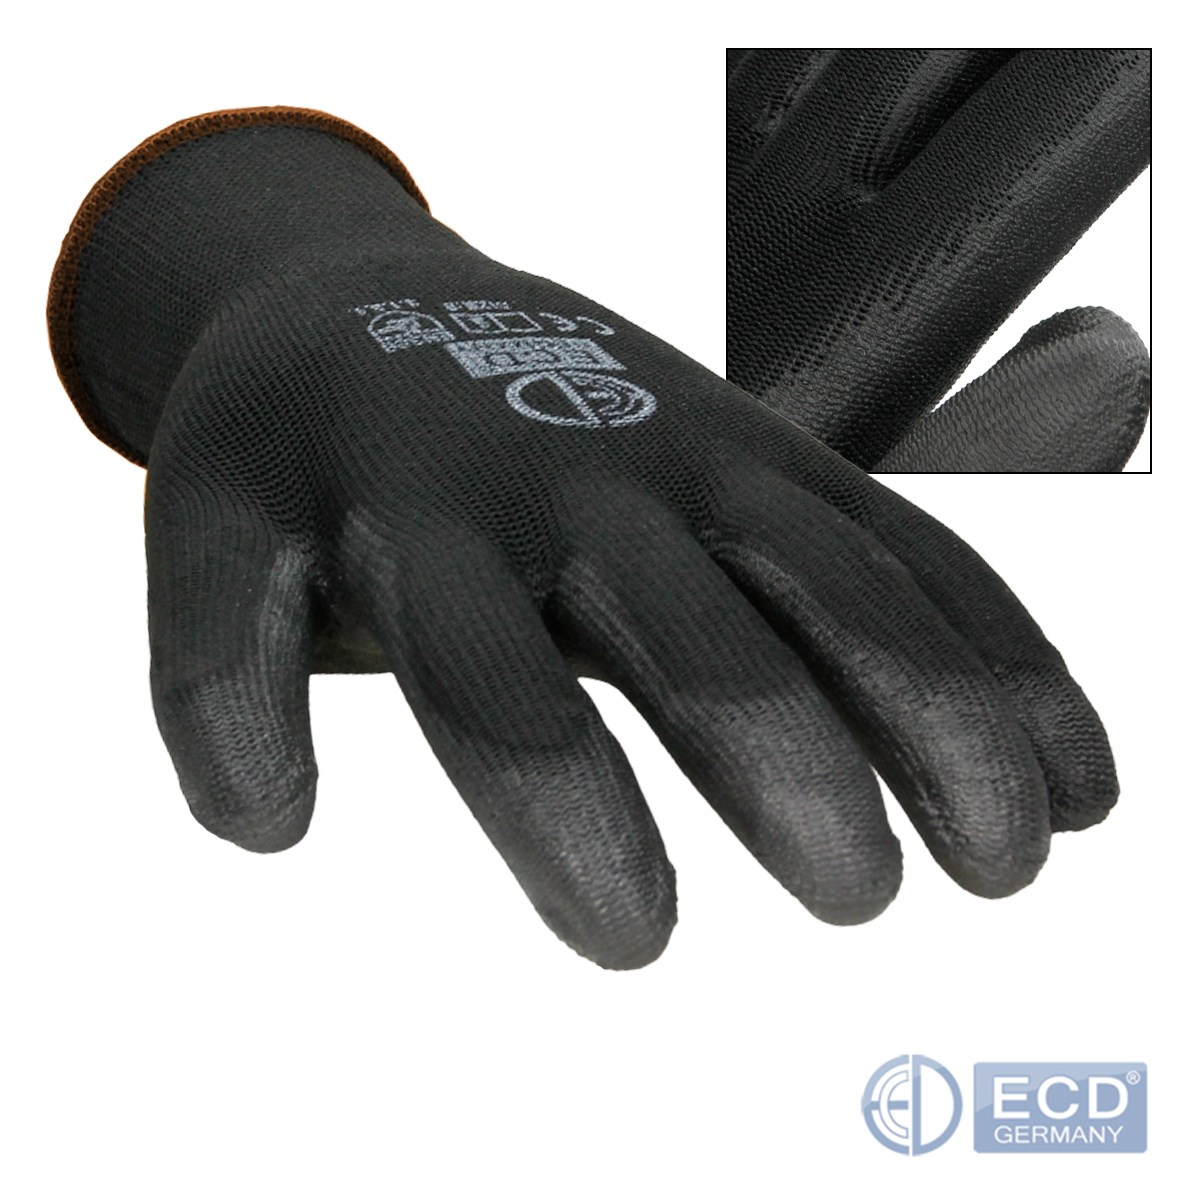 12x-gris-negro-blanco-PU-guantes-de-montaje-para-mecanica-versatiles-tamano-7-11